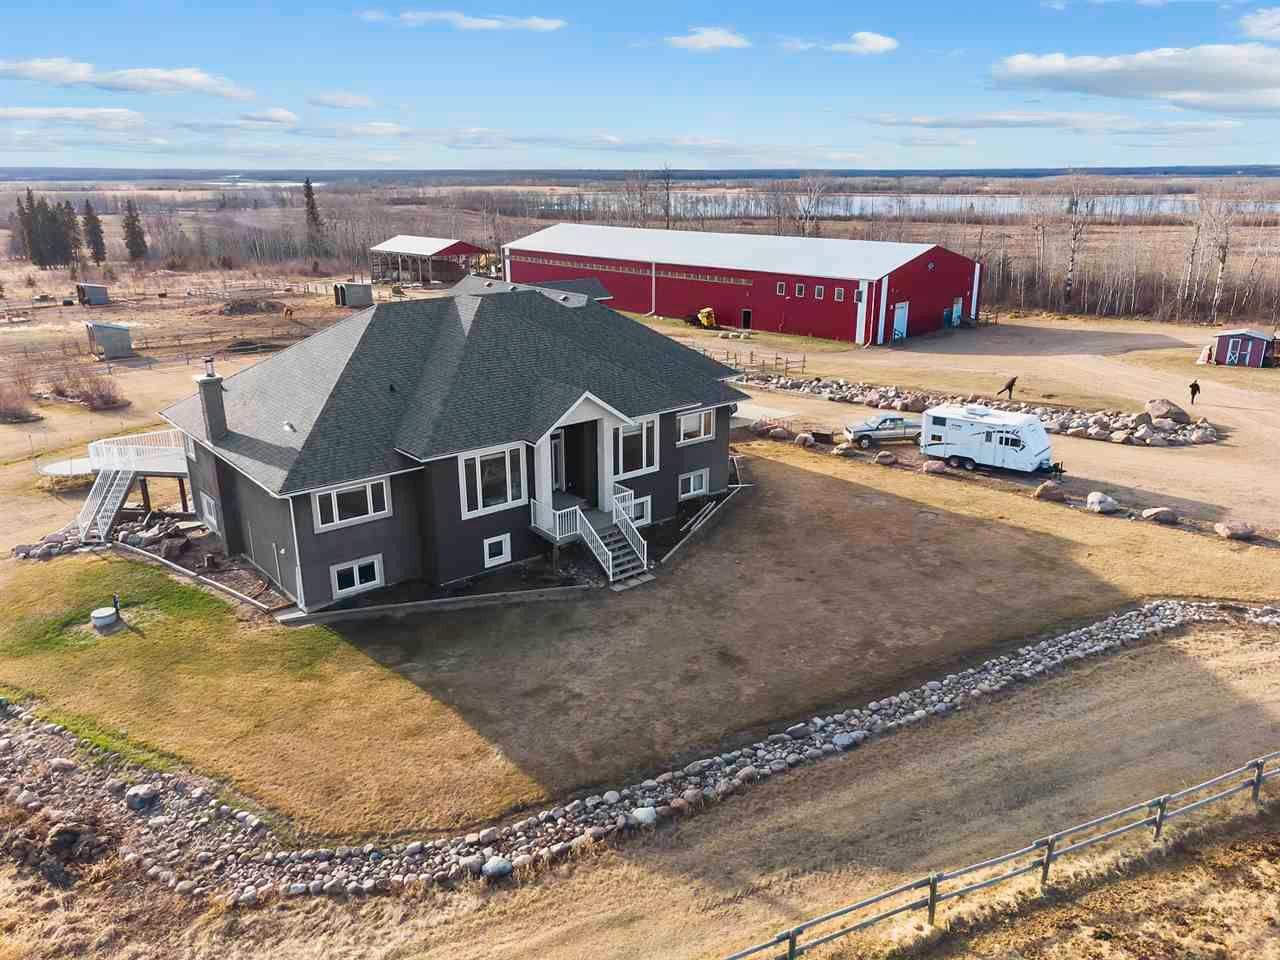 Main Photo: 61016 HWY 897: Rural Bonnyville M.D. House for sale : MLS®# E4240675